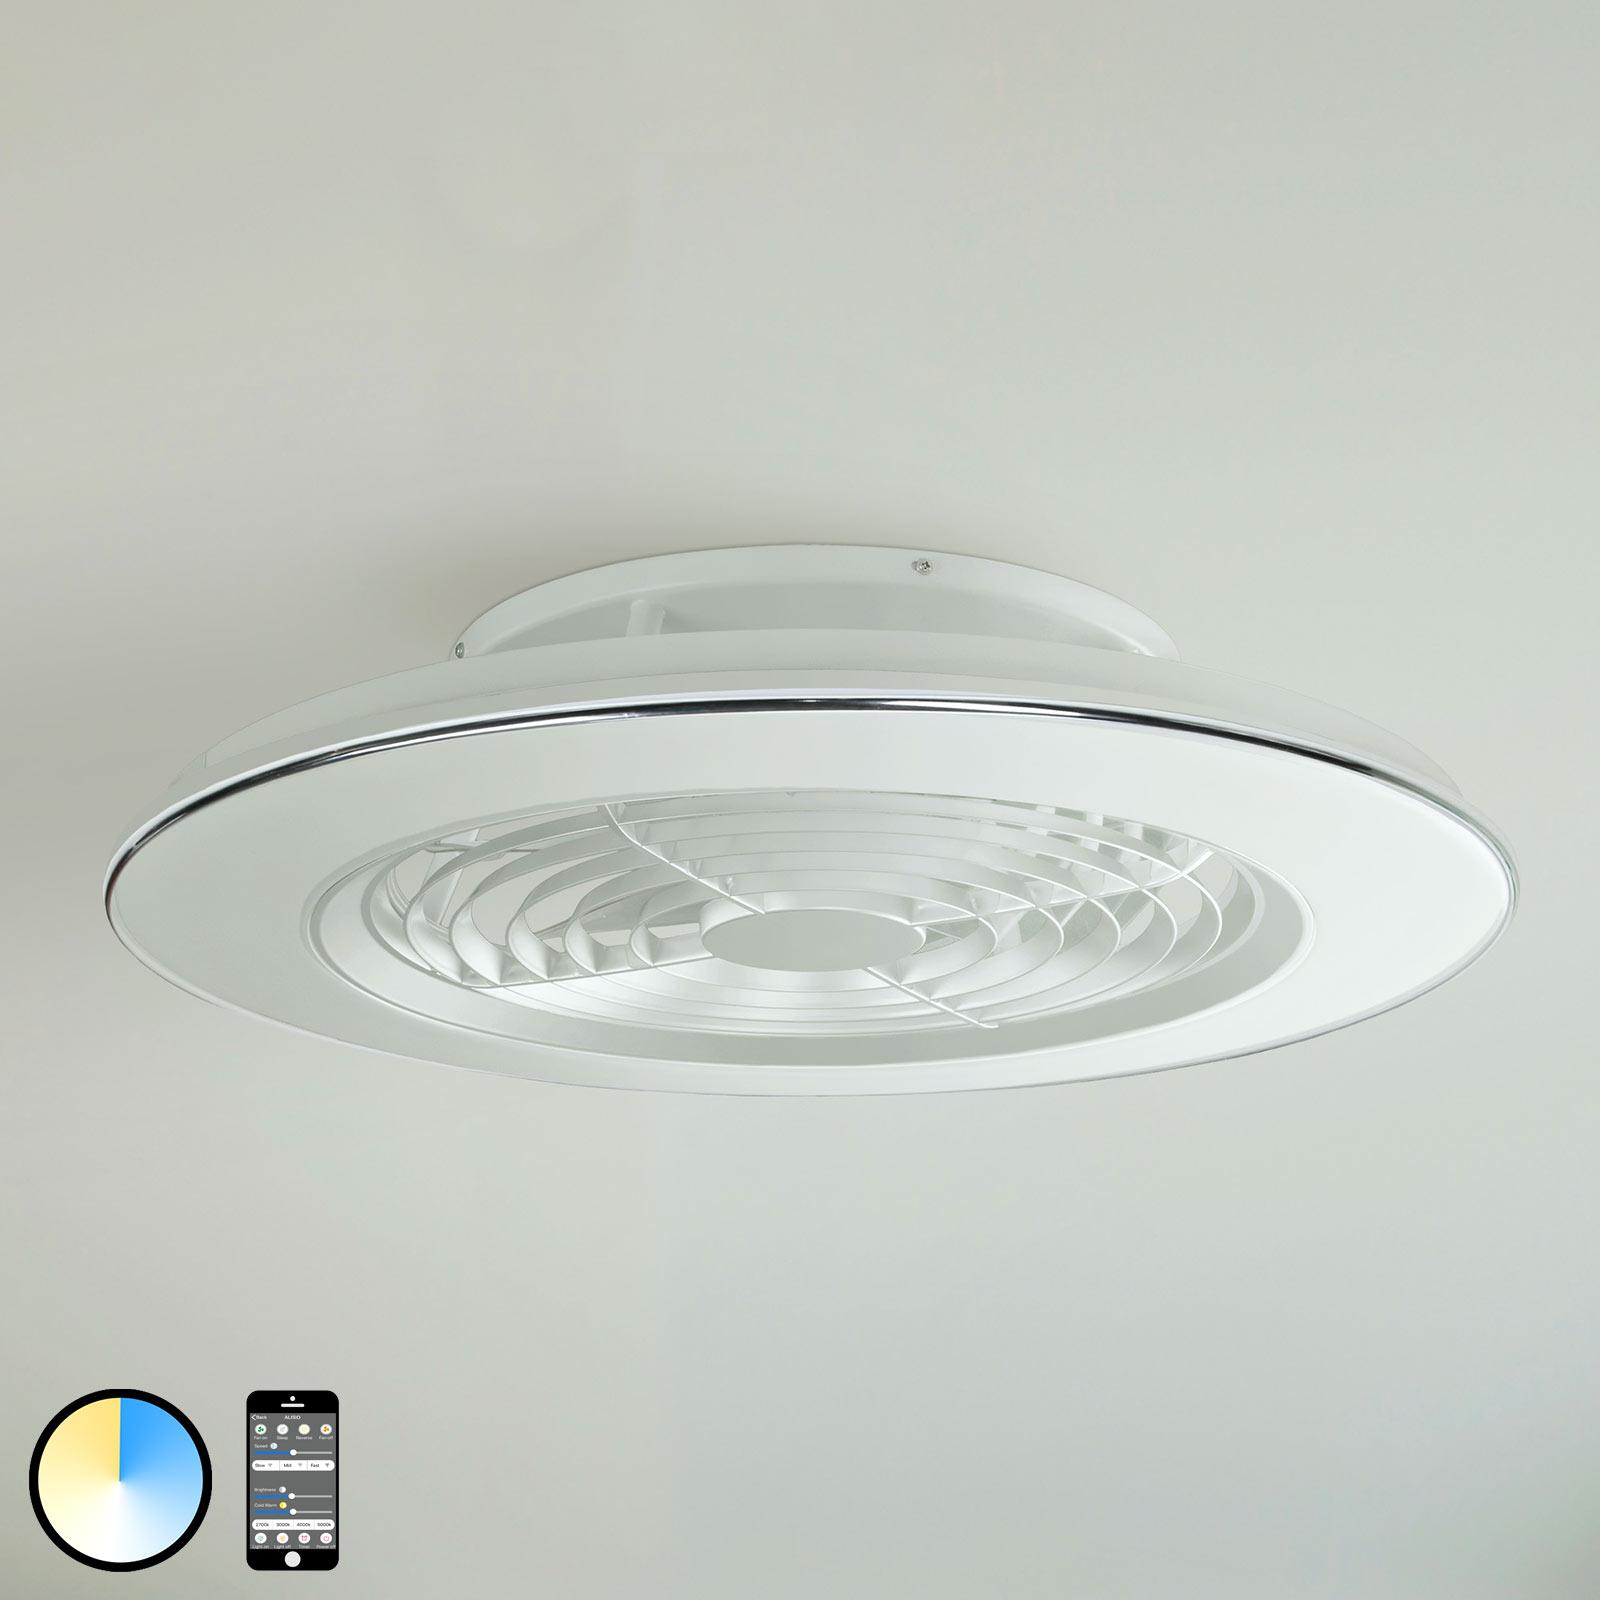 Ventilateur de plafond LED Alisio, appli, blanc